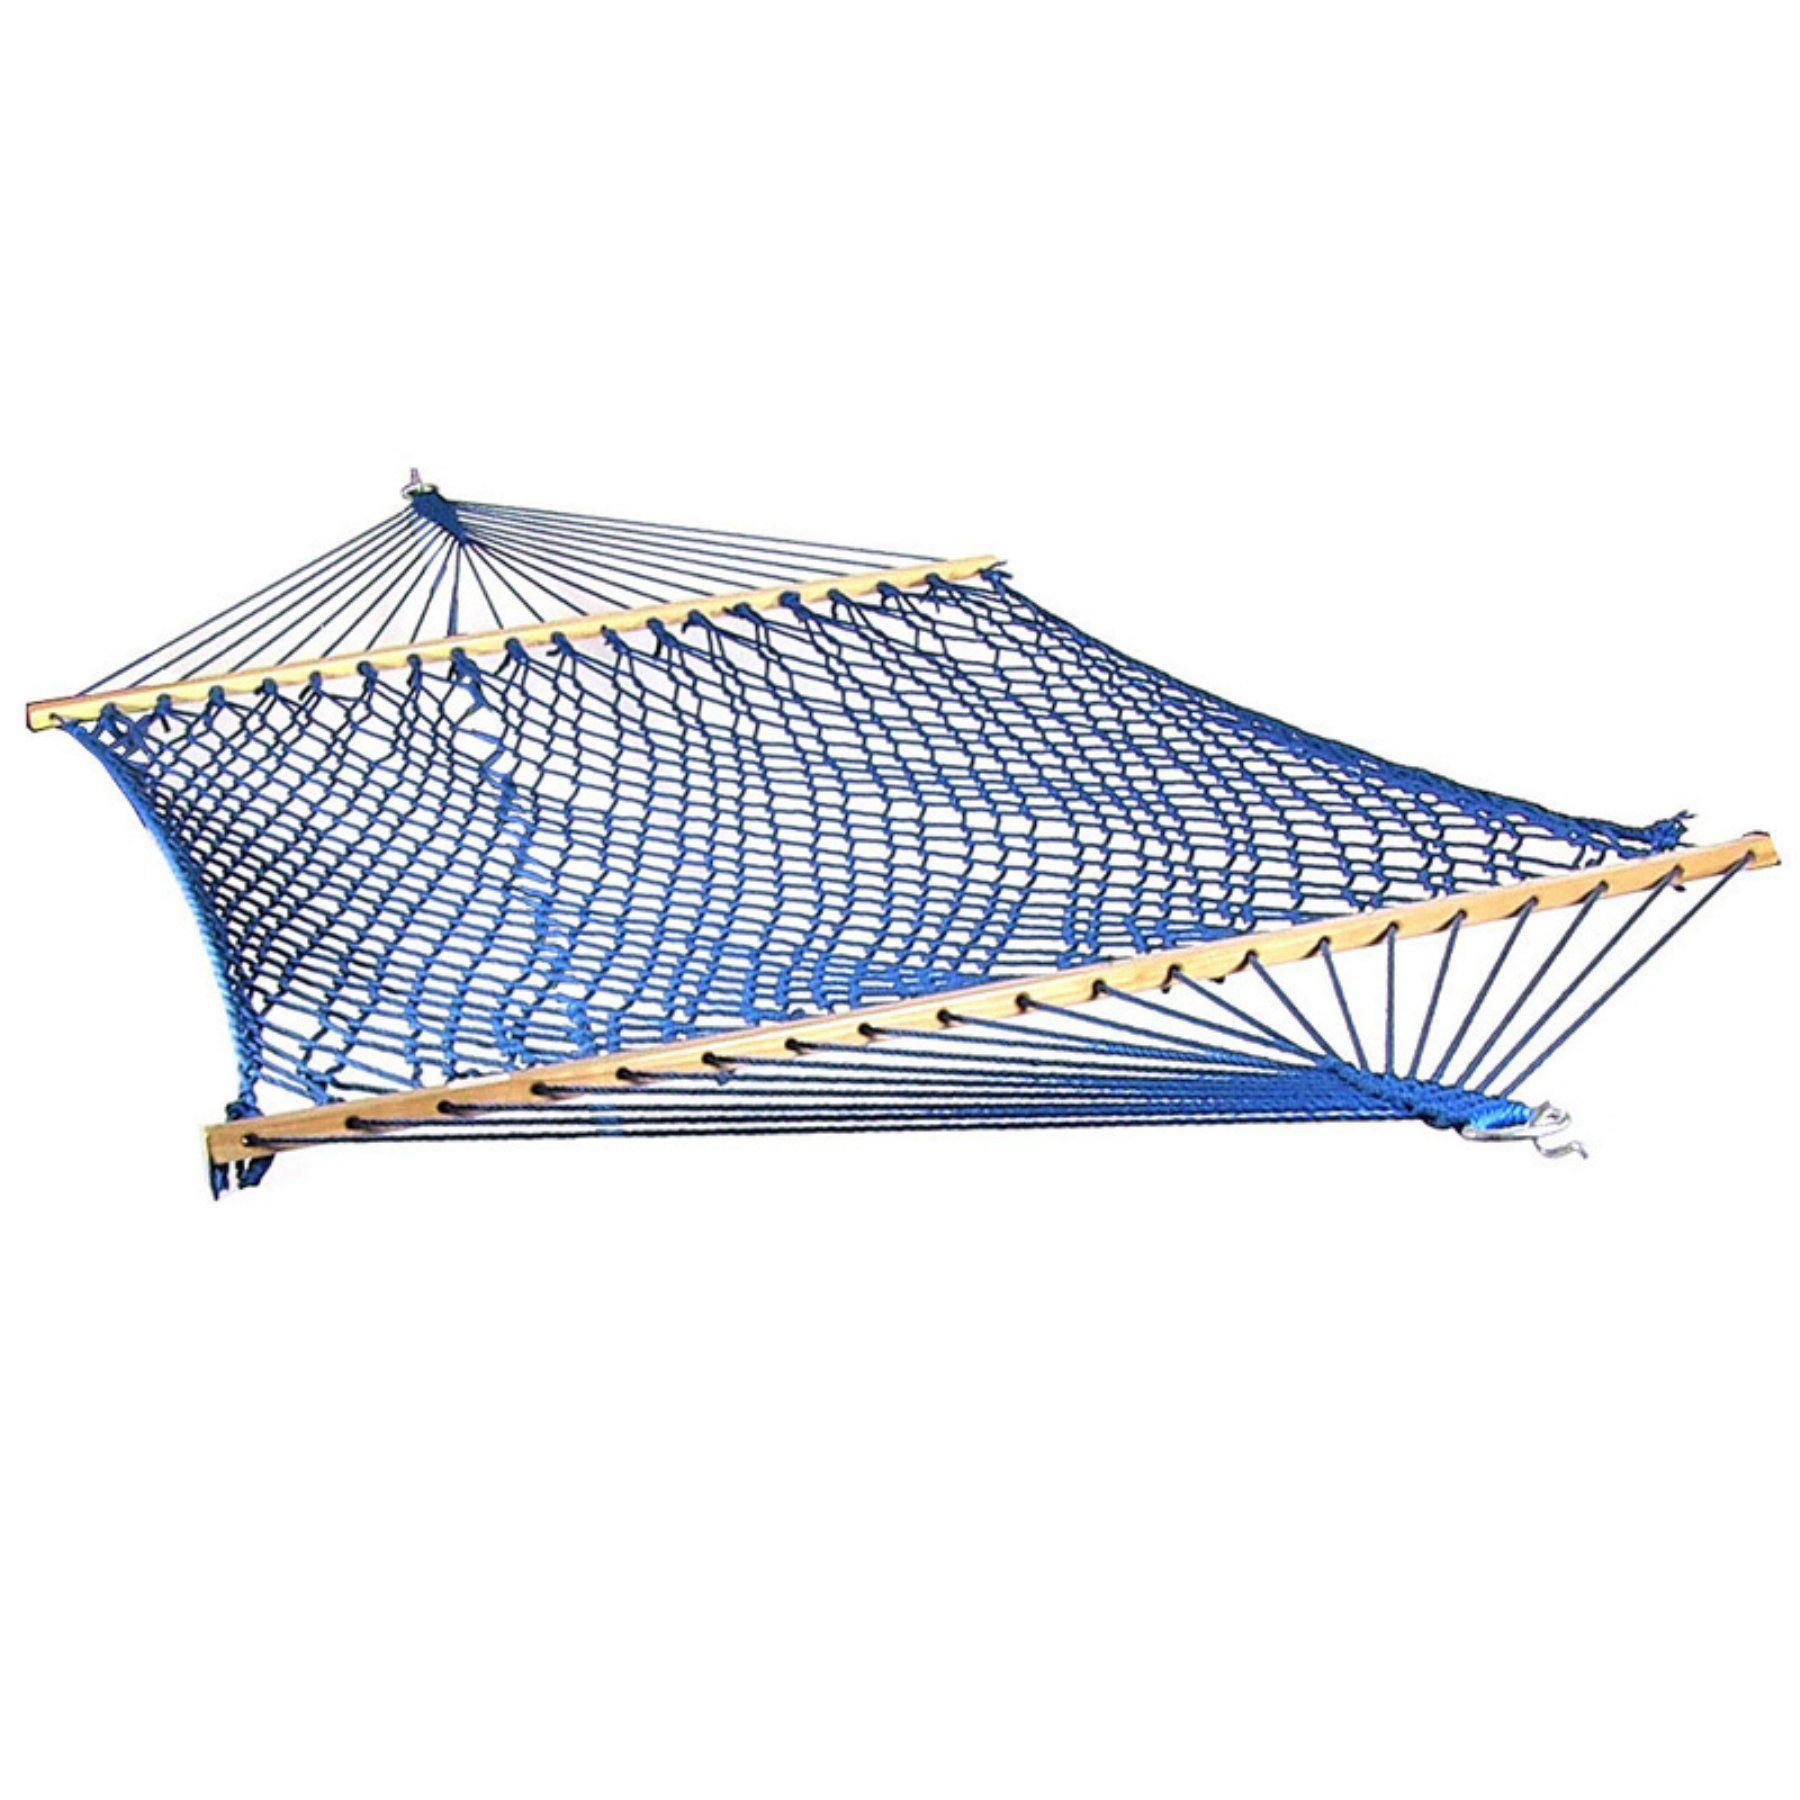 Sunnydaze decor extra large caribbean rope hammock with spreader